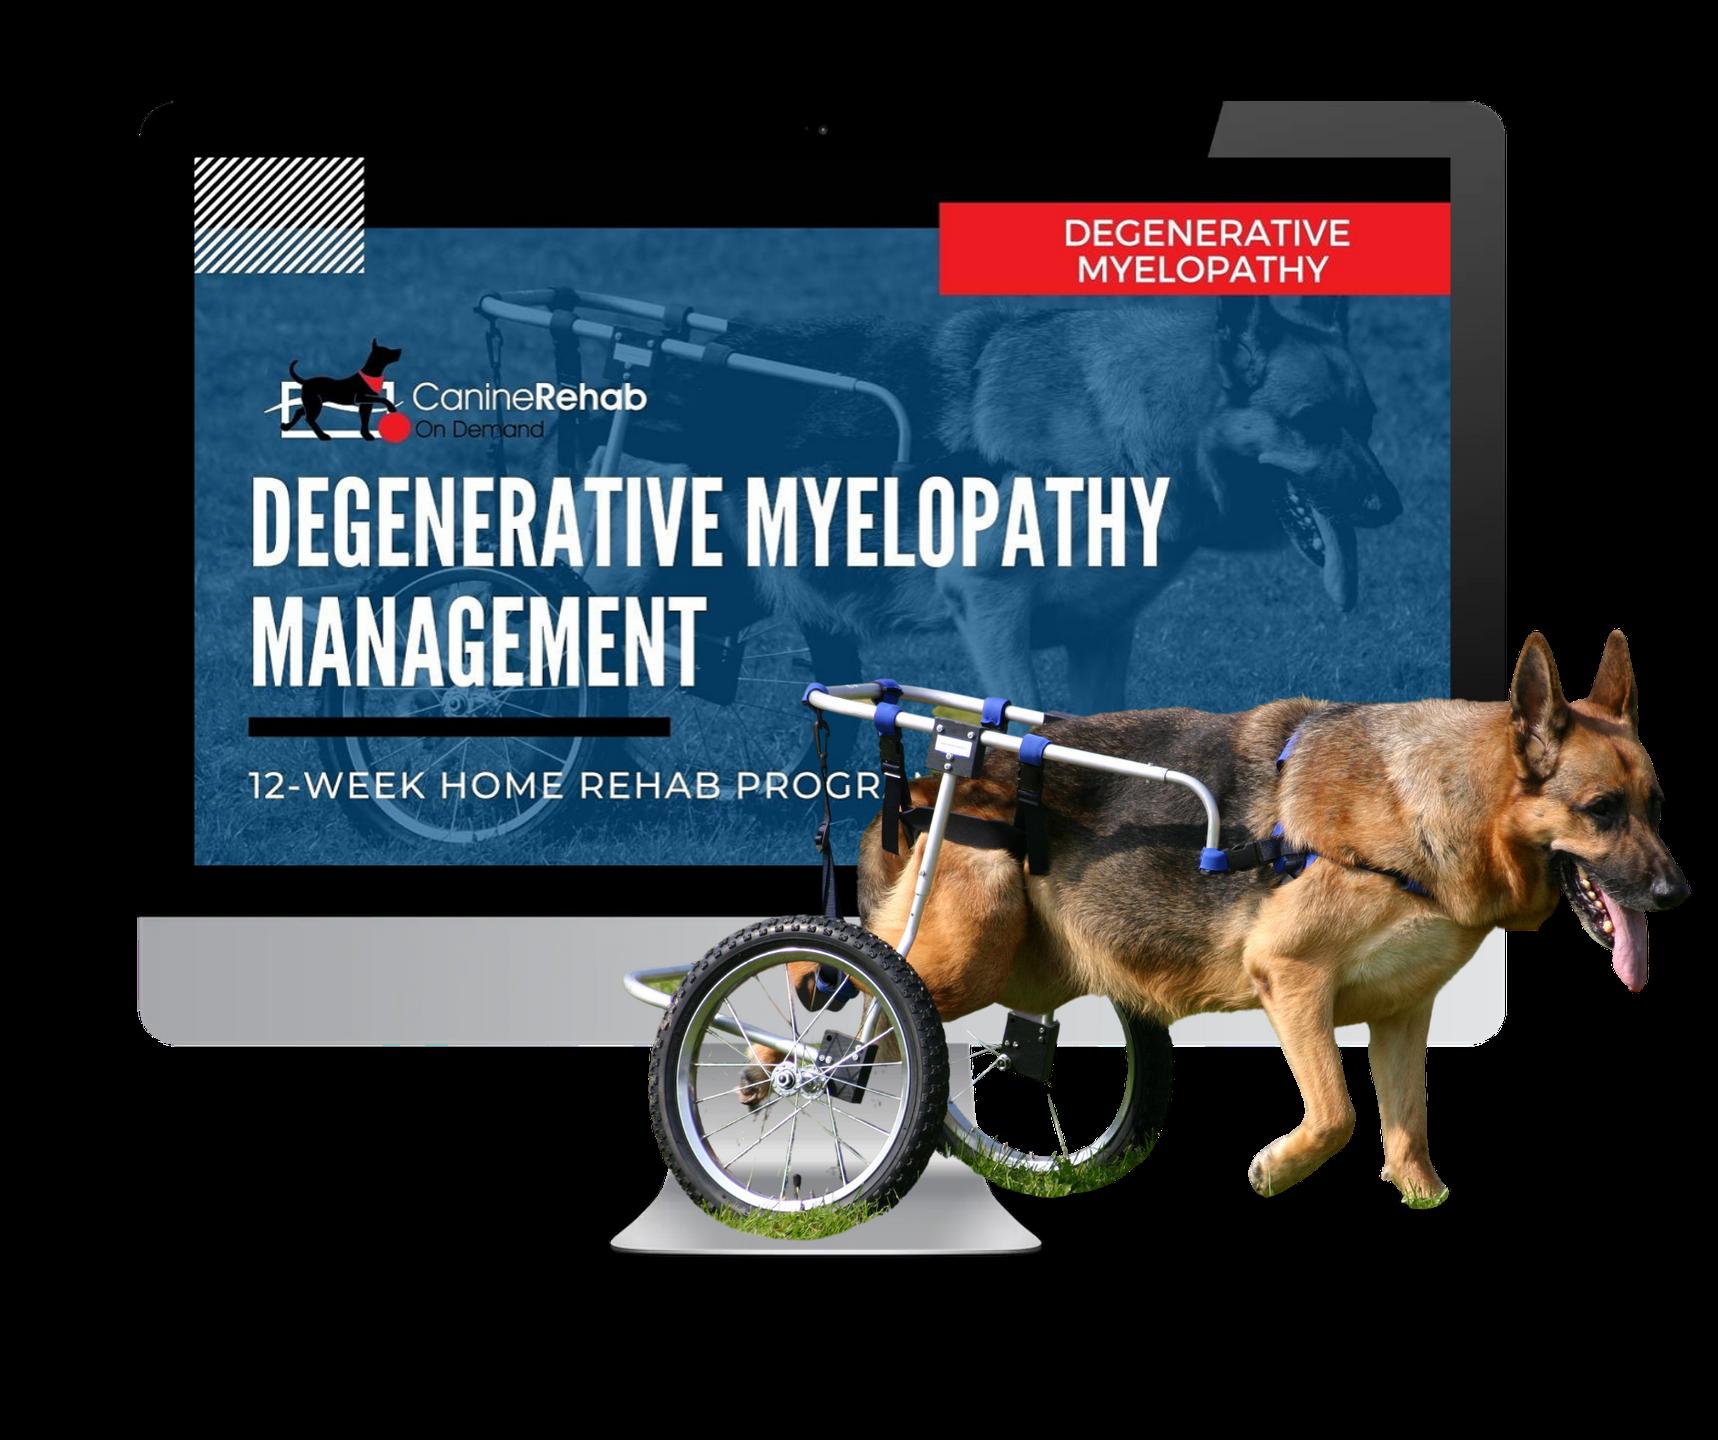 Degenerative Myelopathy 12-Week Home Rehab Program